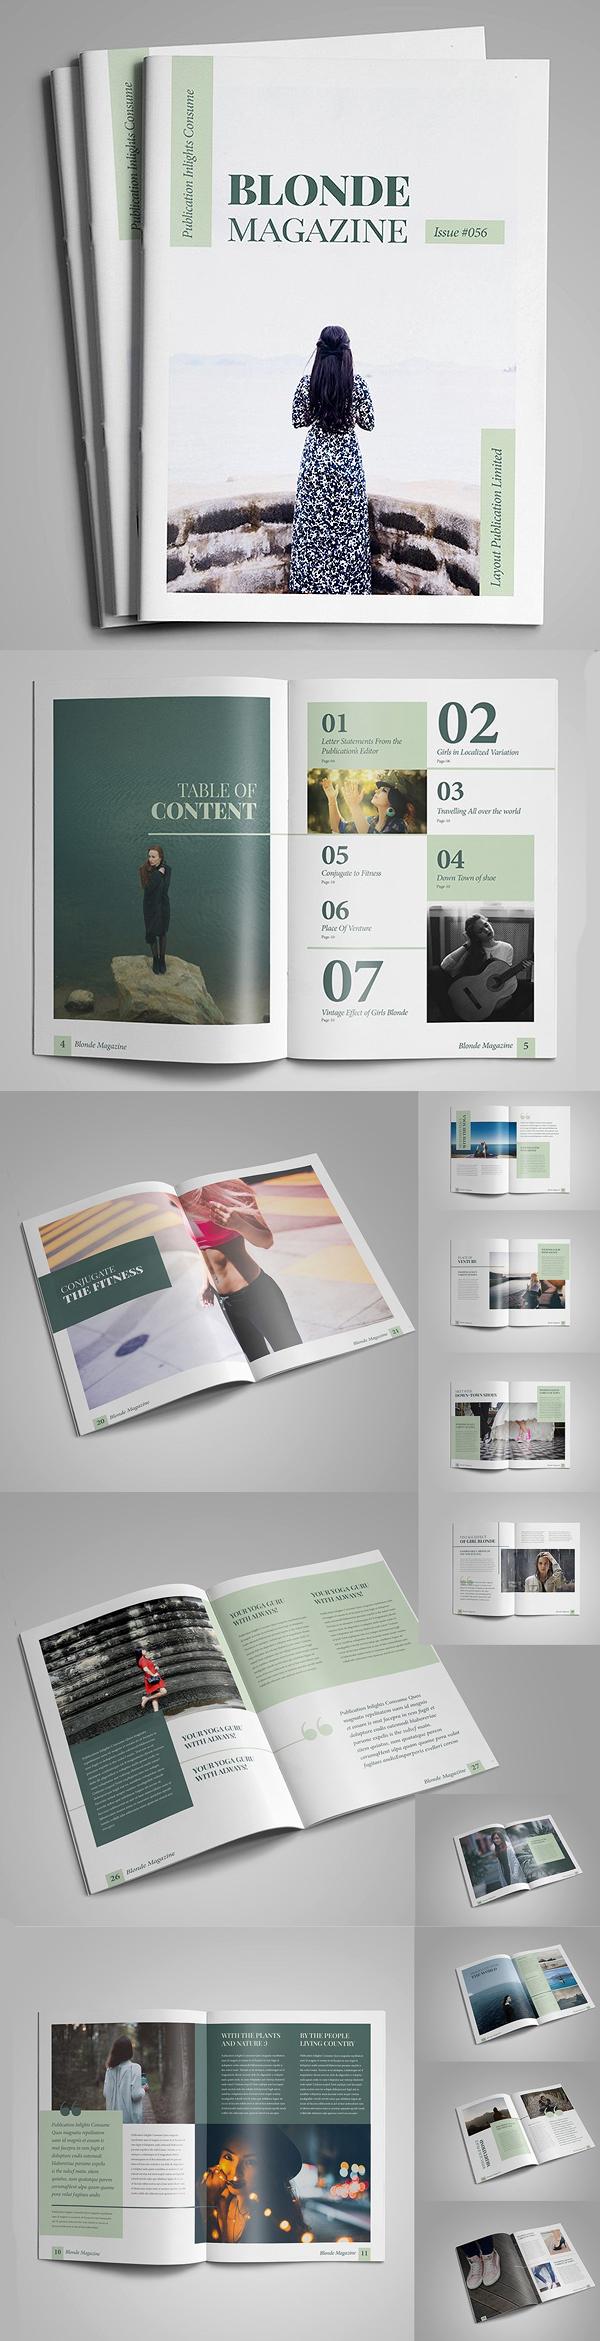 100 Professional Corporate Brochure Templates - 21